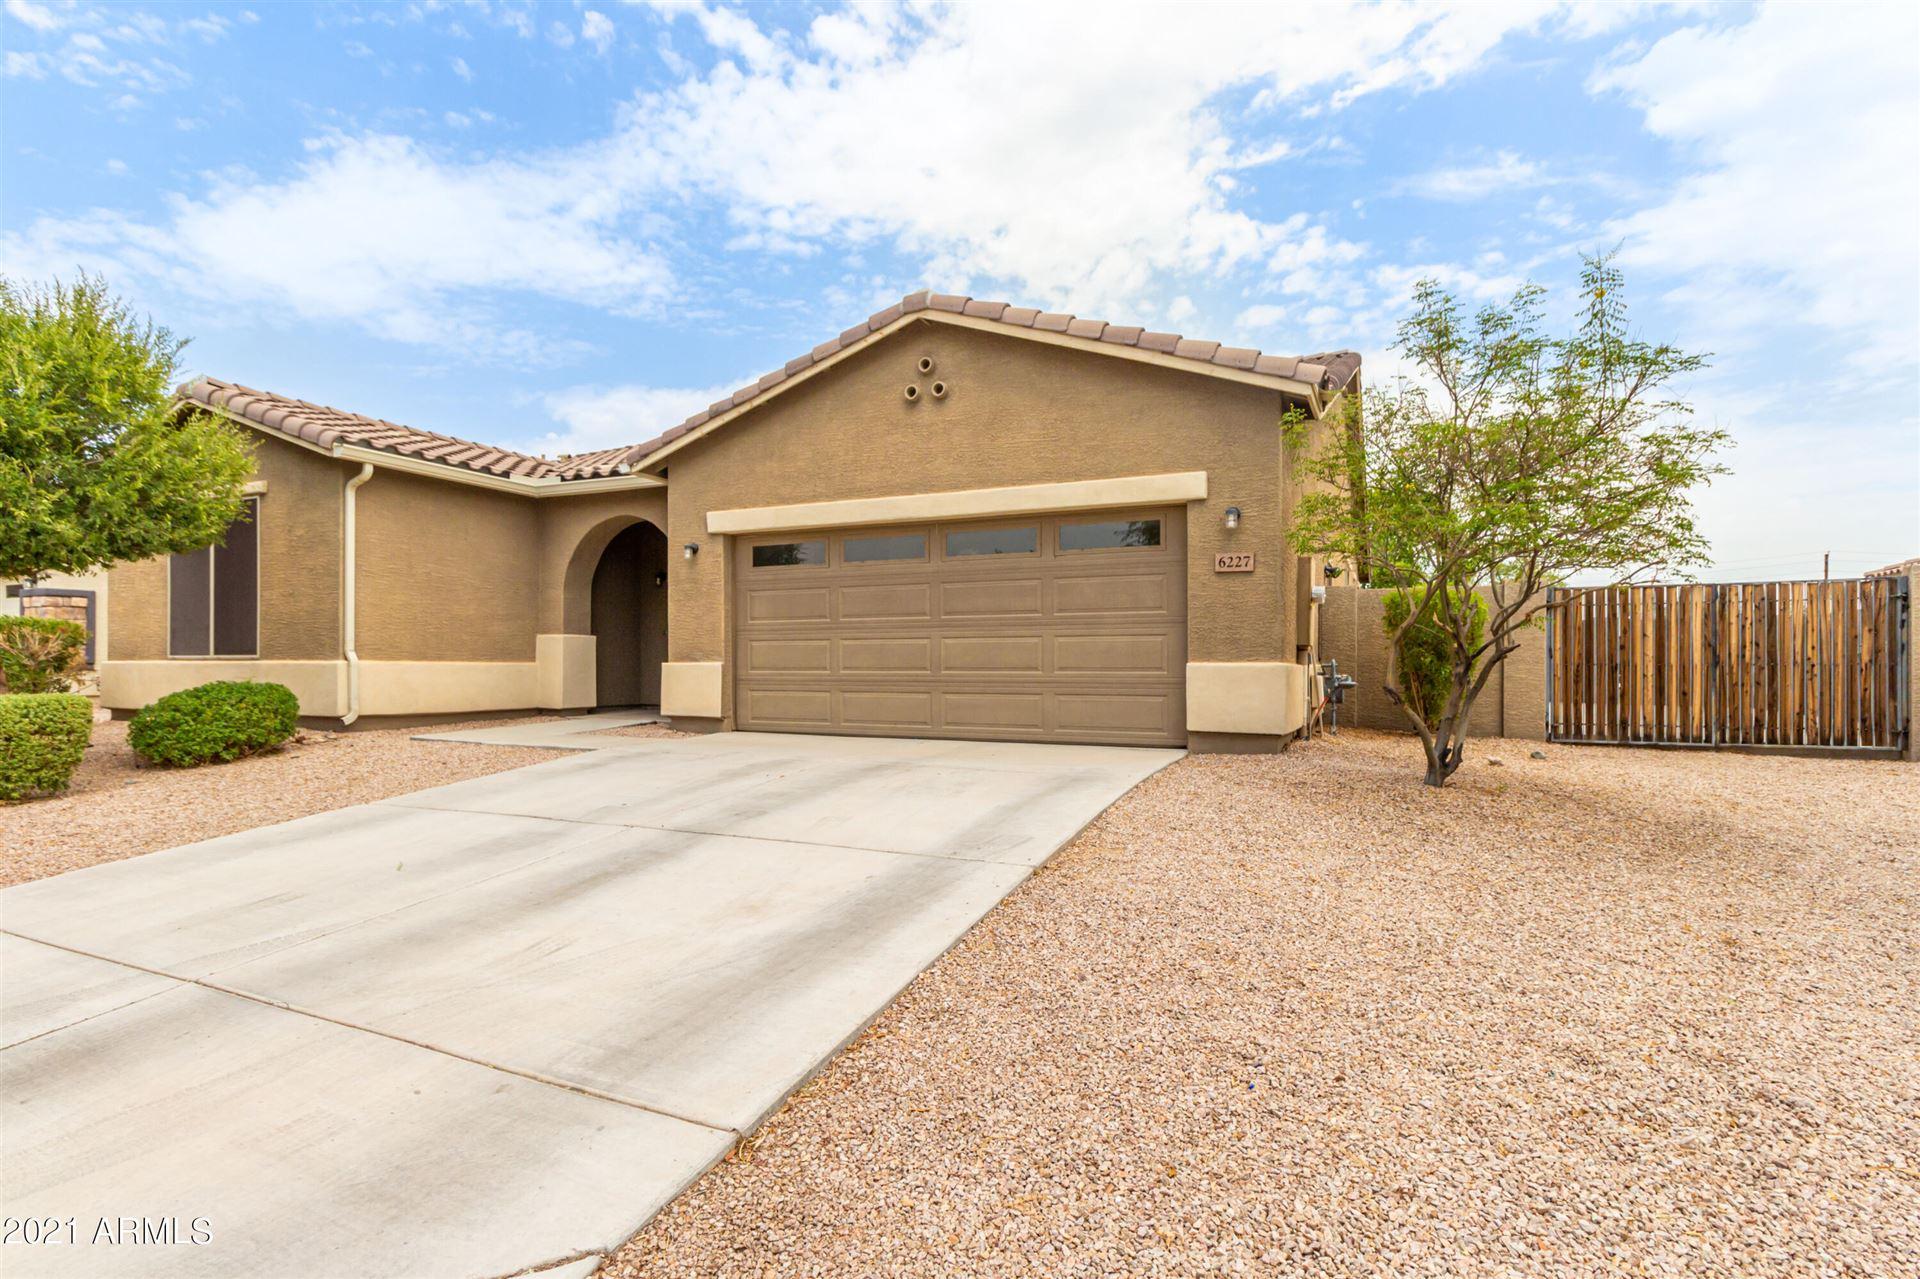 Photo of 6227 N 75TH Drive, Glendale, AZ 85303 (MLS # 6268161)